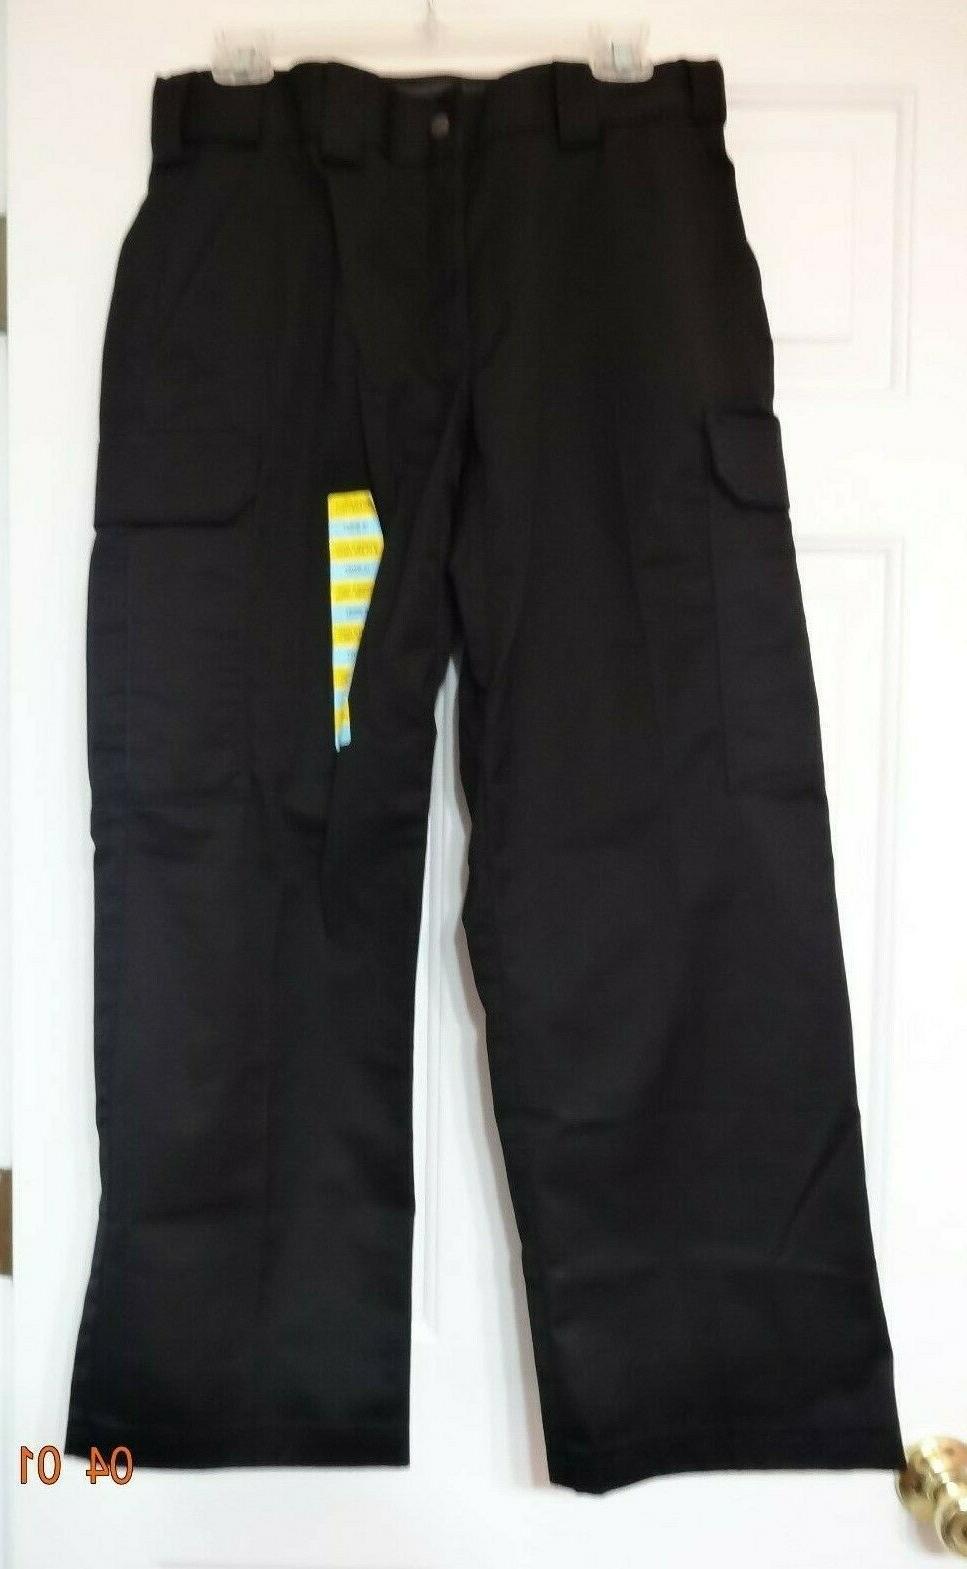 5.11 Tactical Cargo Women Pants